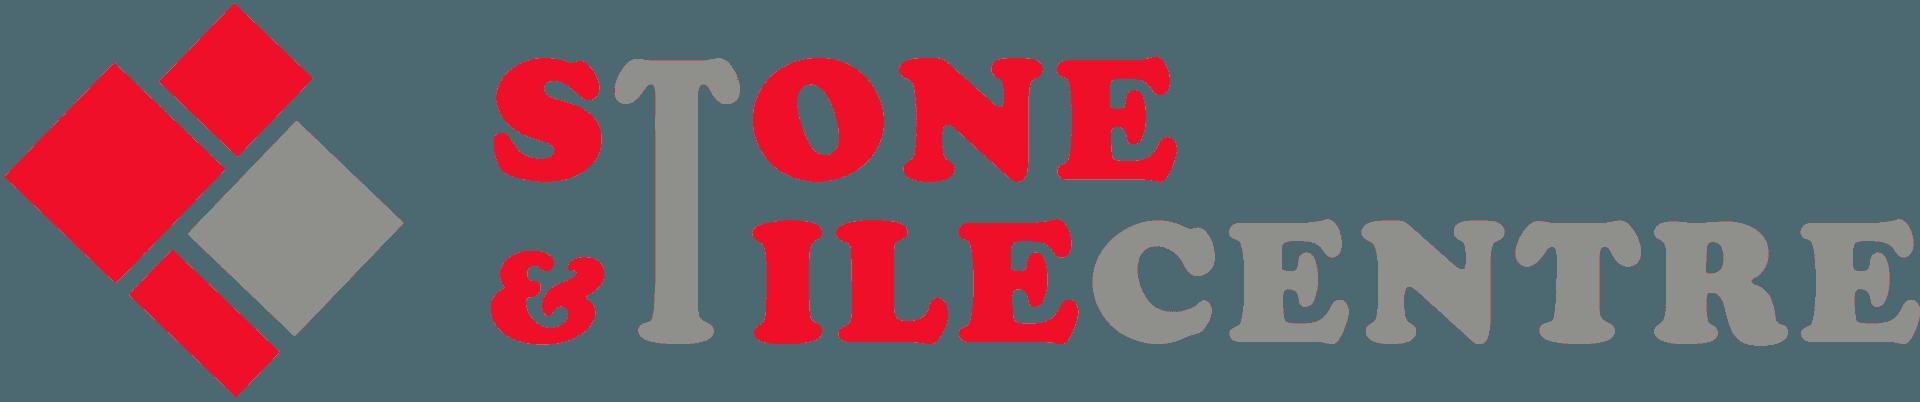 stone & tile centre logo